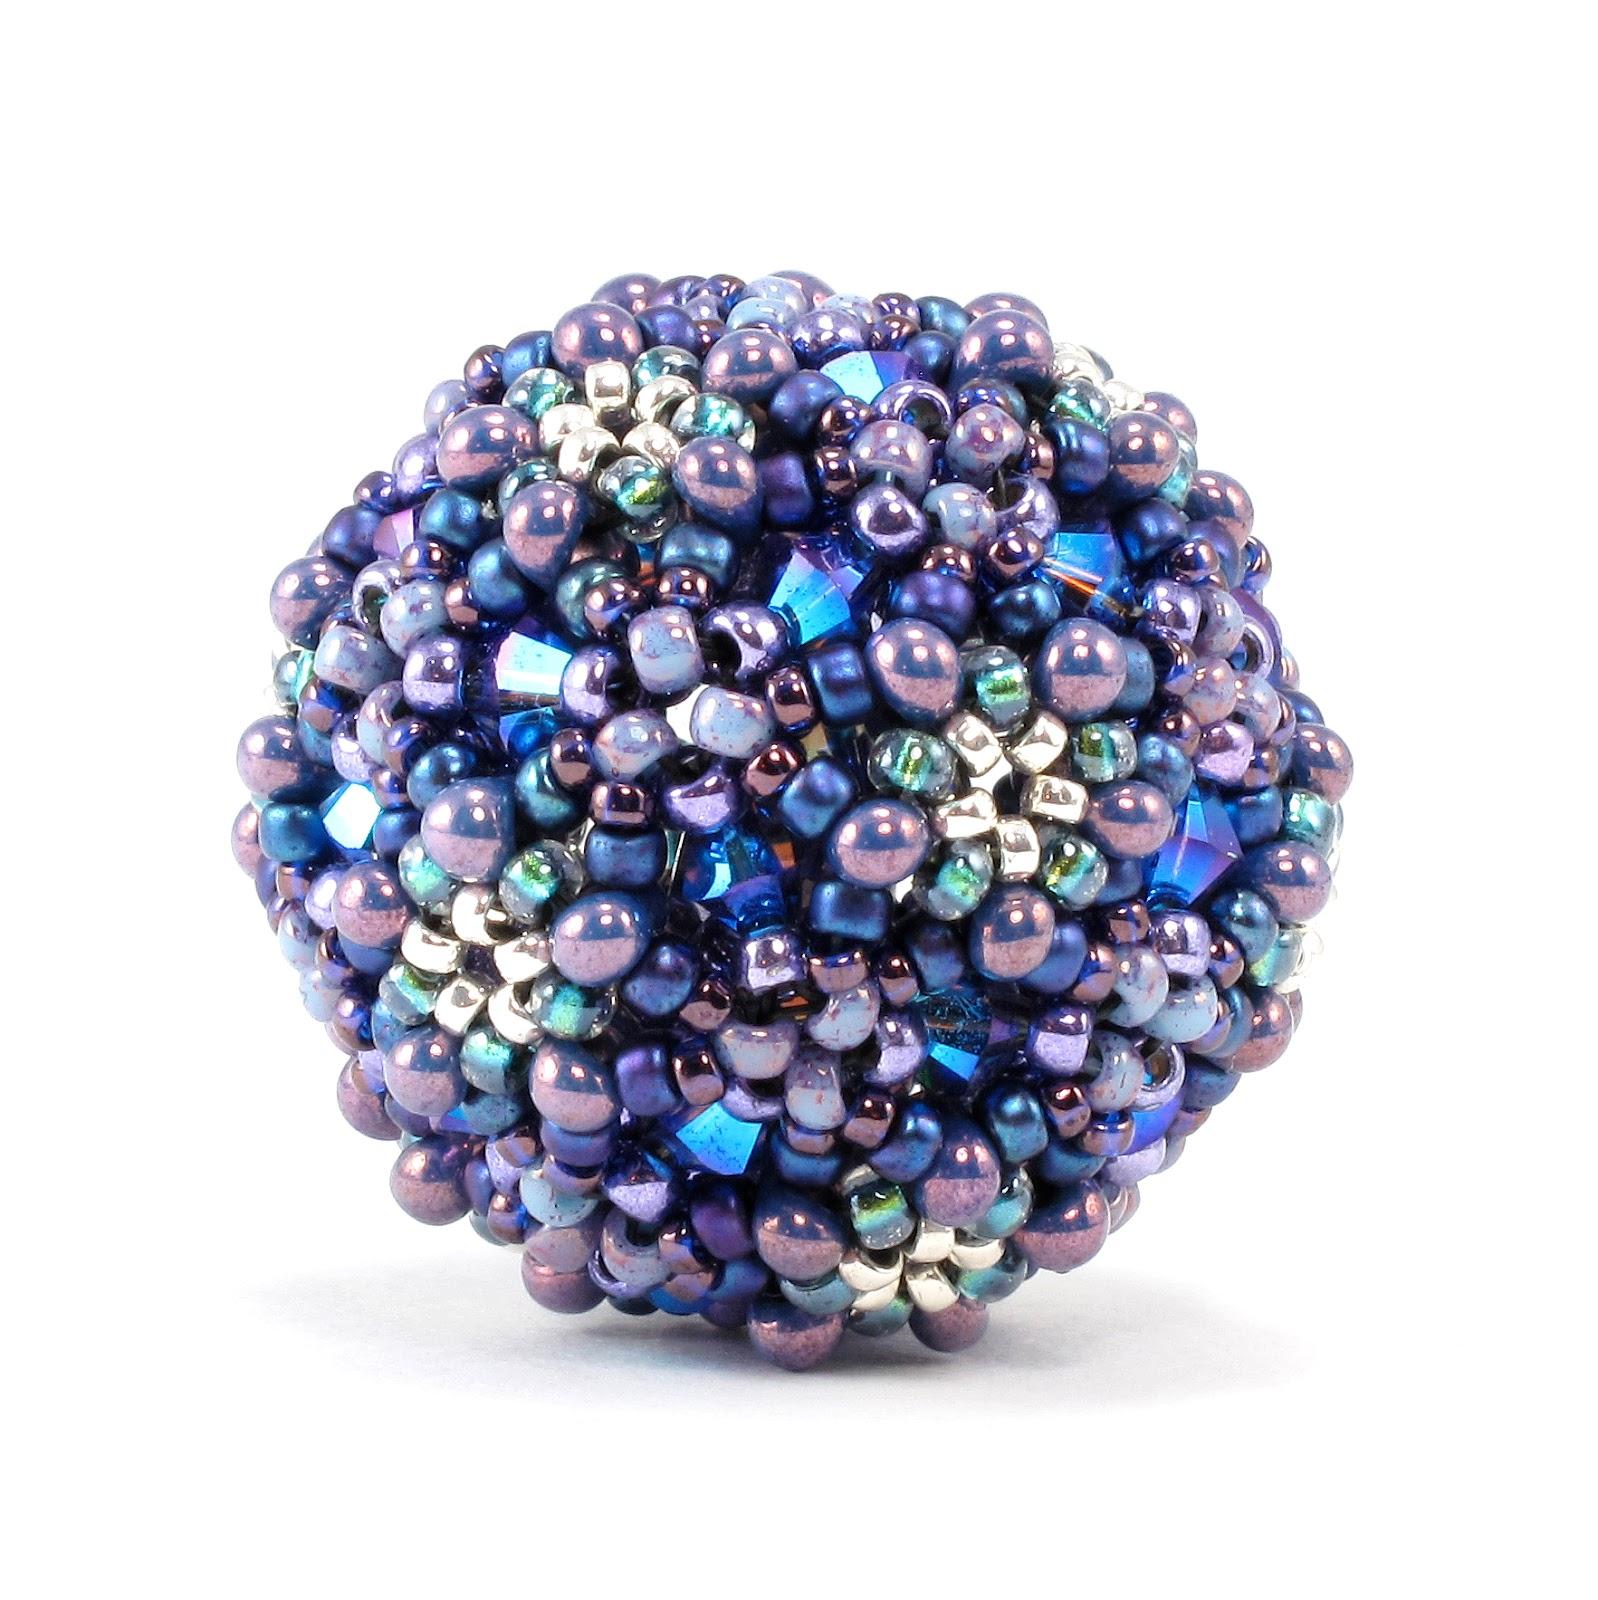 Crystal Bead Beads: Bead Origami: New Pattern And Kits: Crystal Ball Beaded Bead